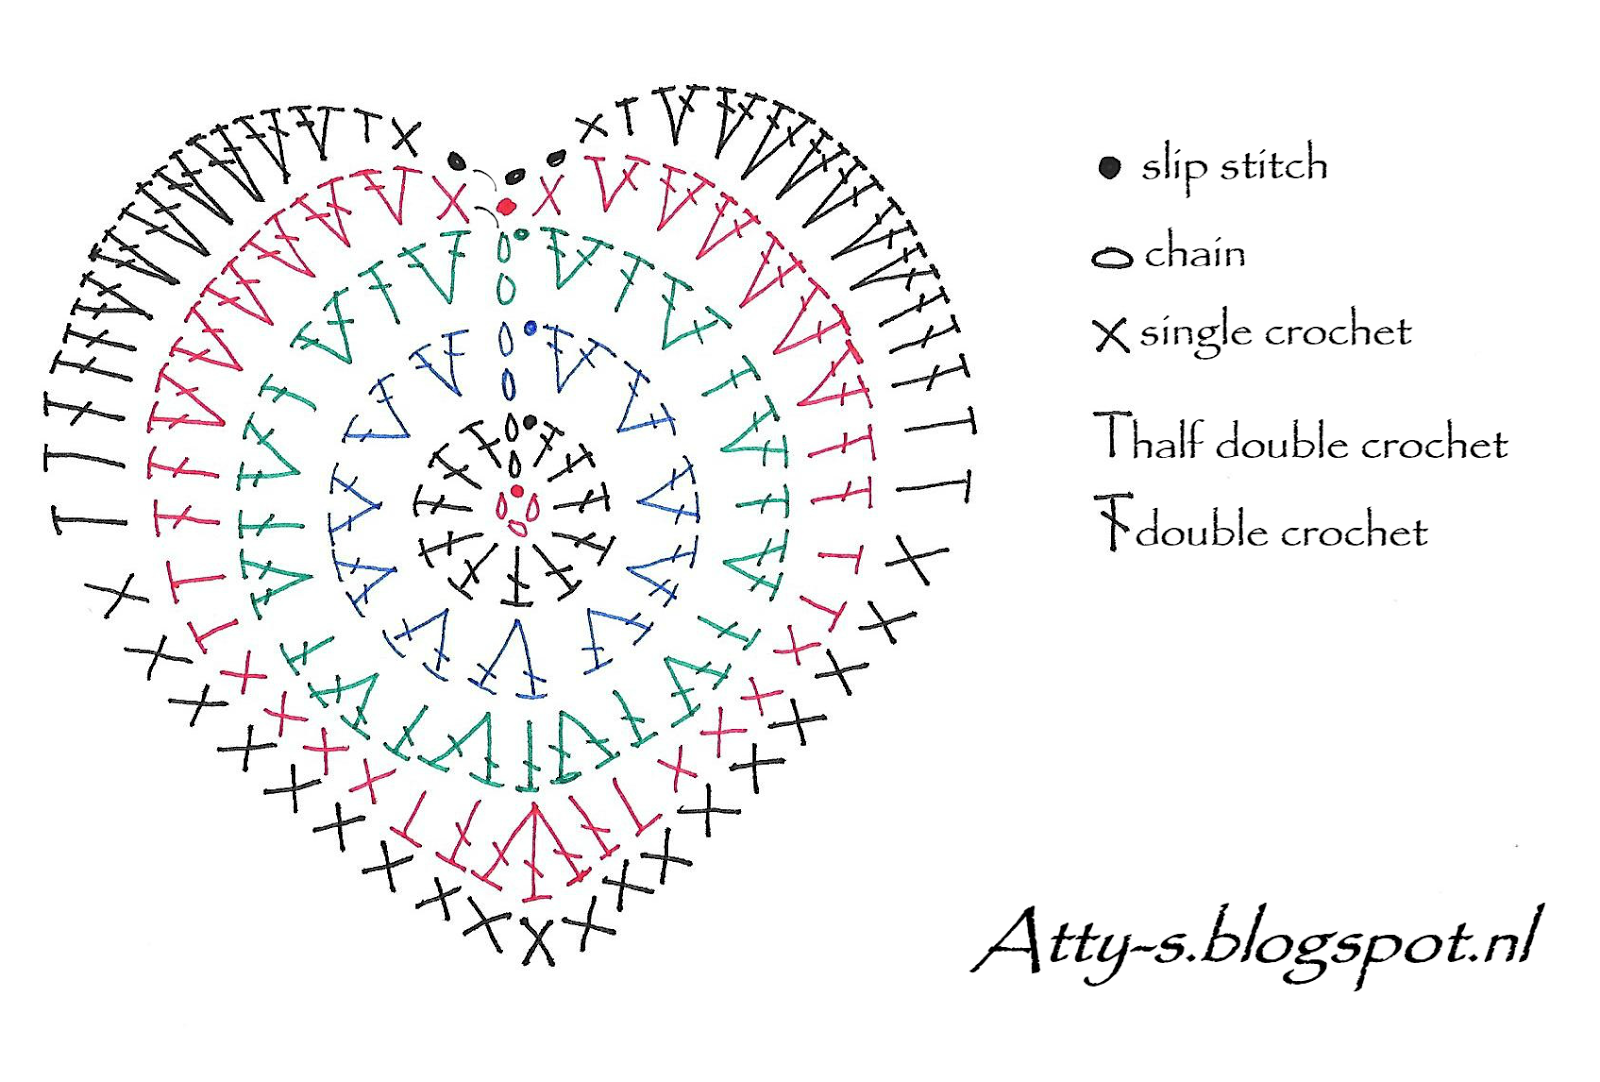 Corazon15 patron | μινιατουρες βελονακι διαφορα | Pinterest ...